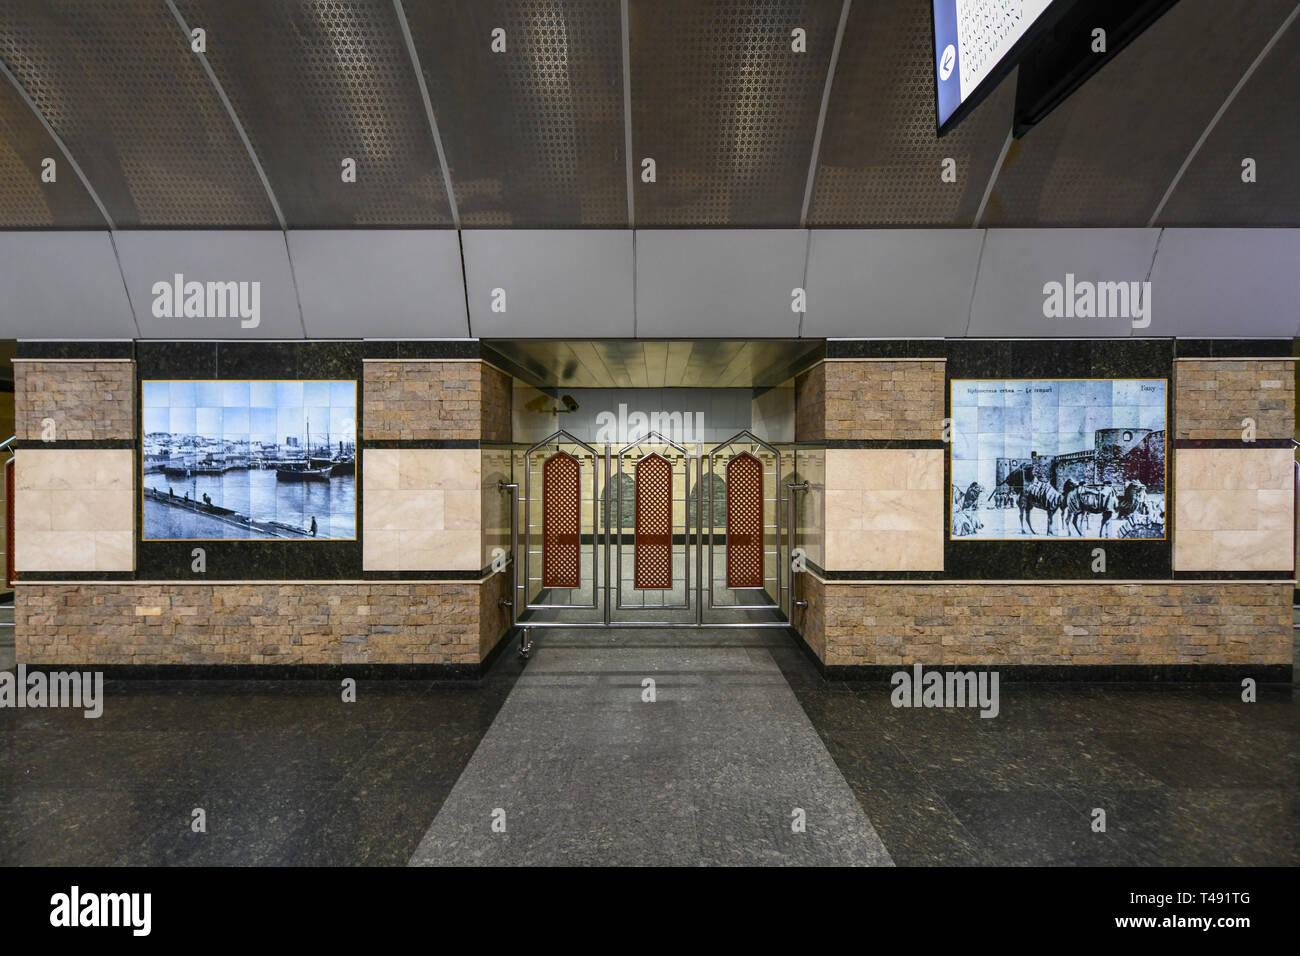 Baku, Azerbaijan - July 15, 2018: Metro station in the city of Baku, Azerbaijan. - Stock Image